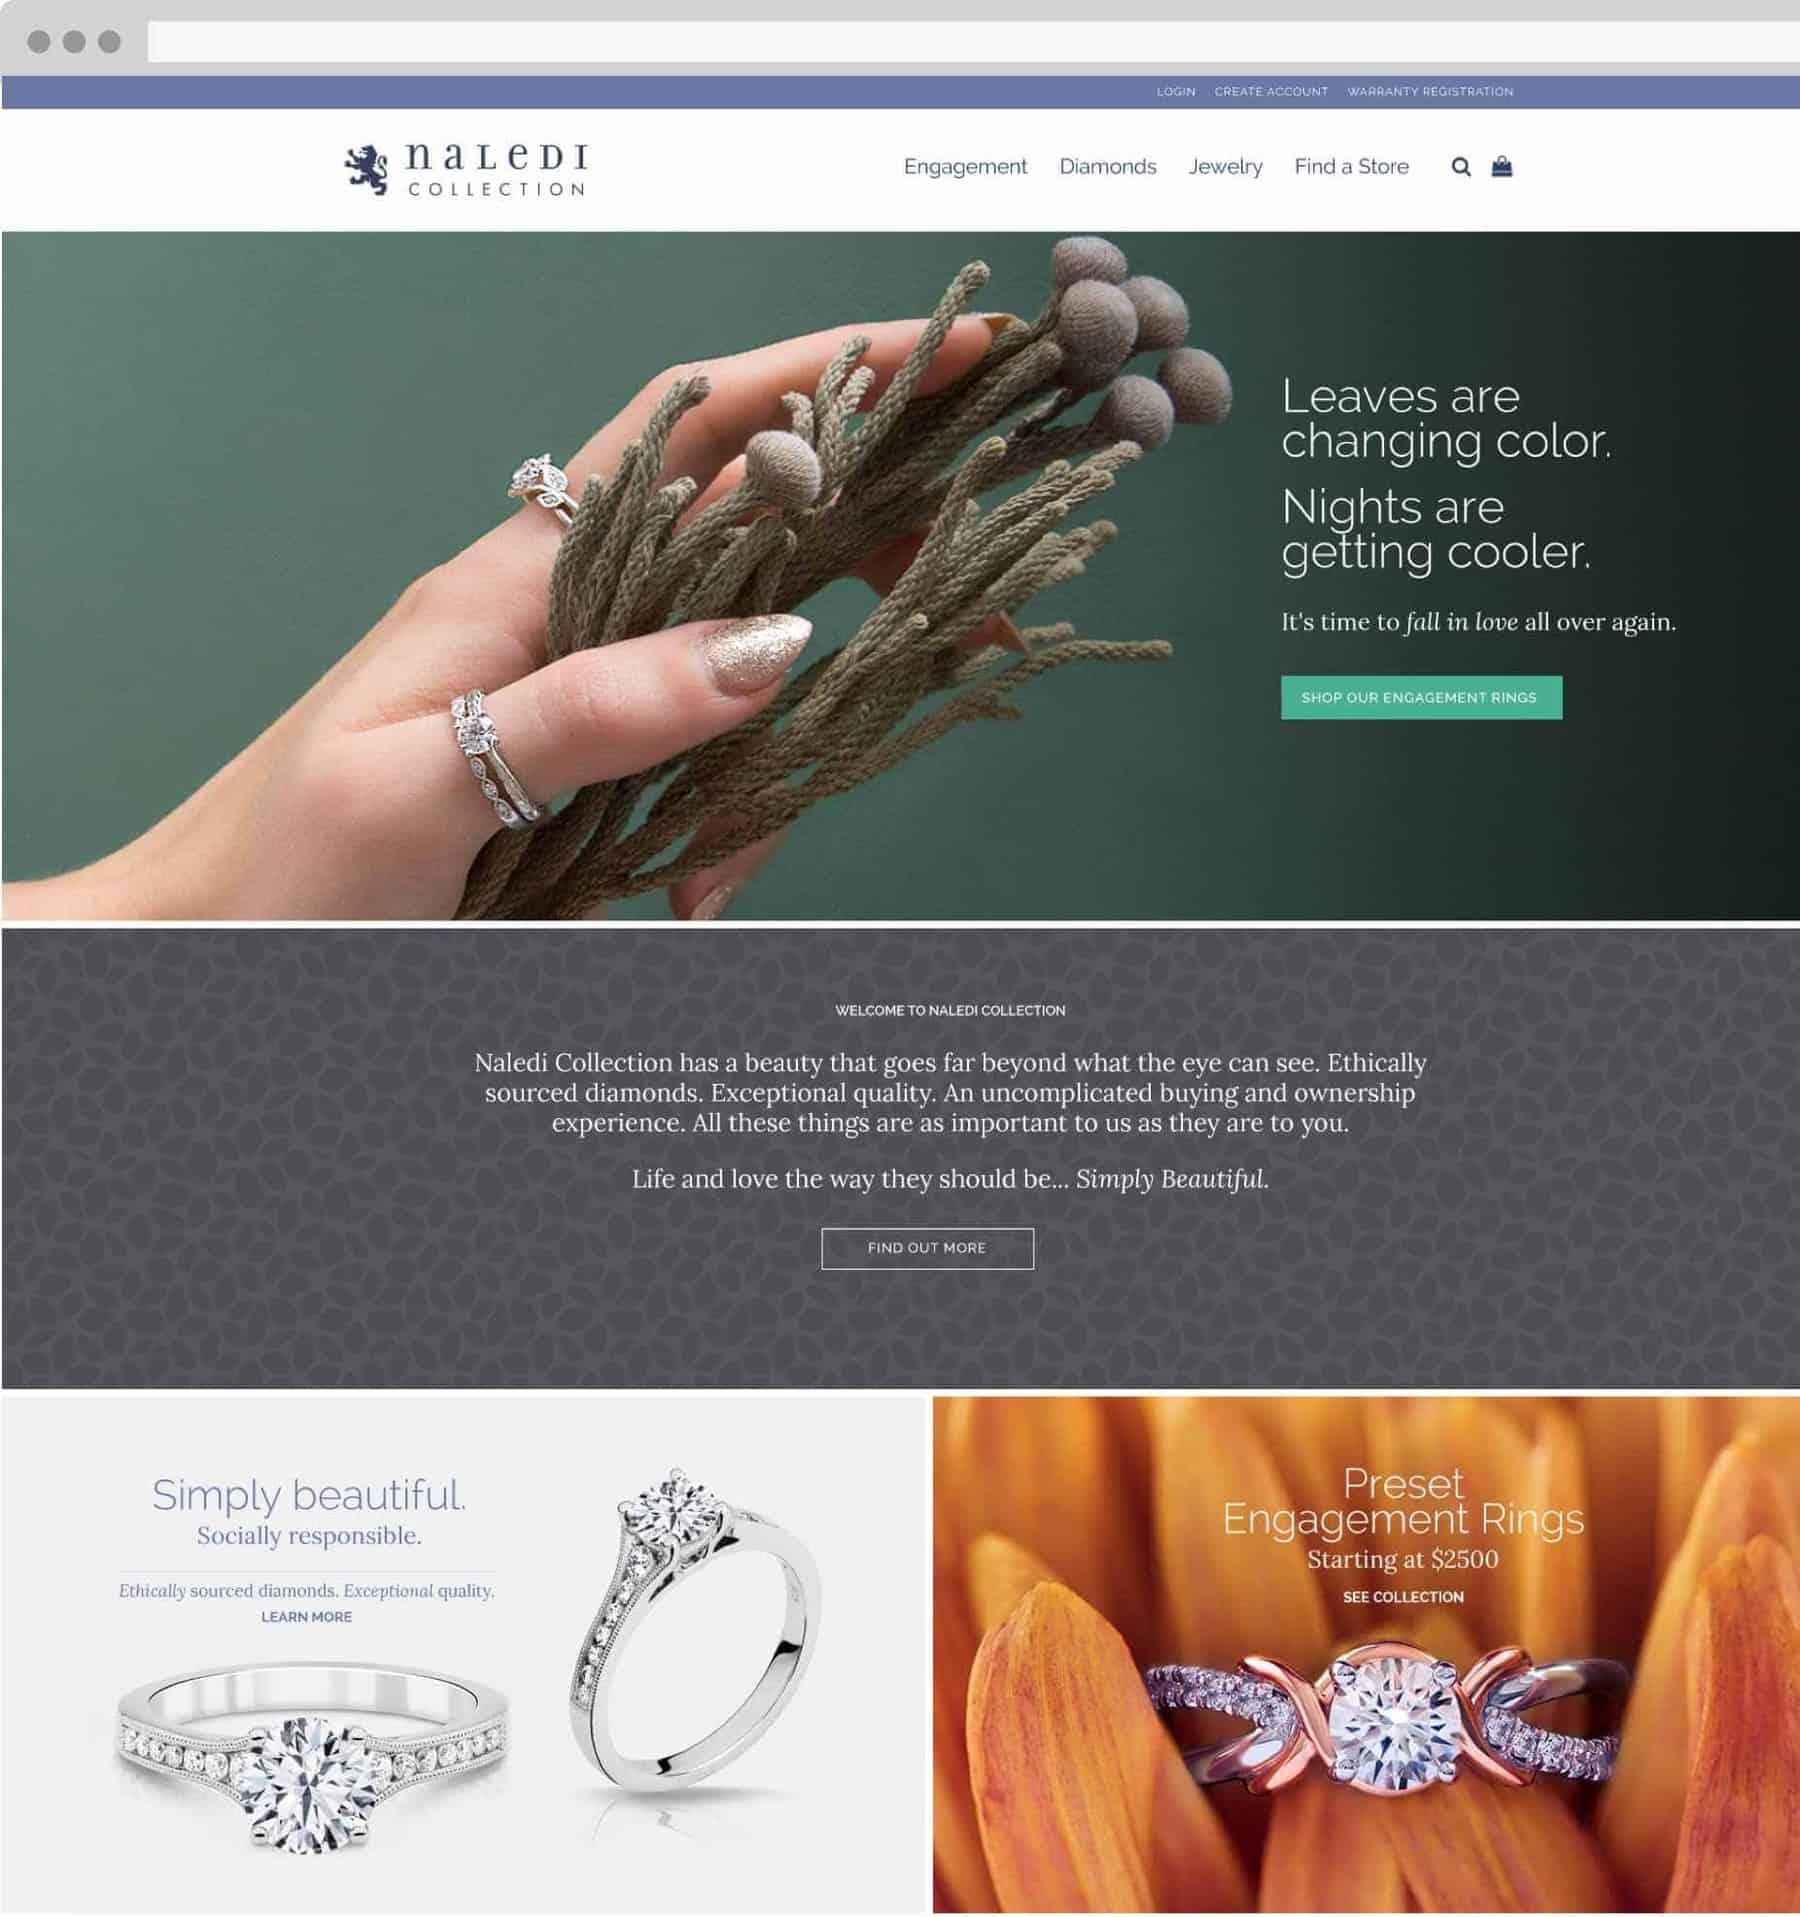 Naledi Collection page on desktop